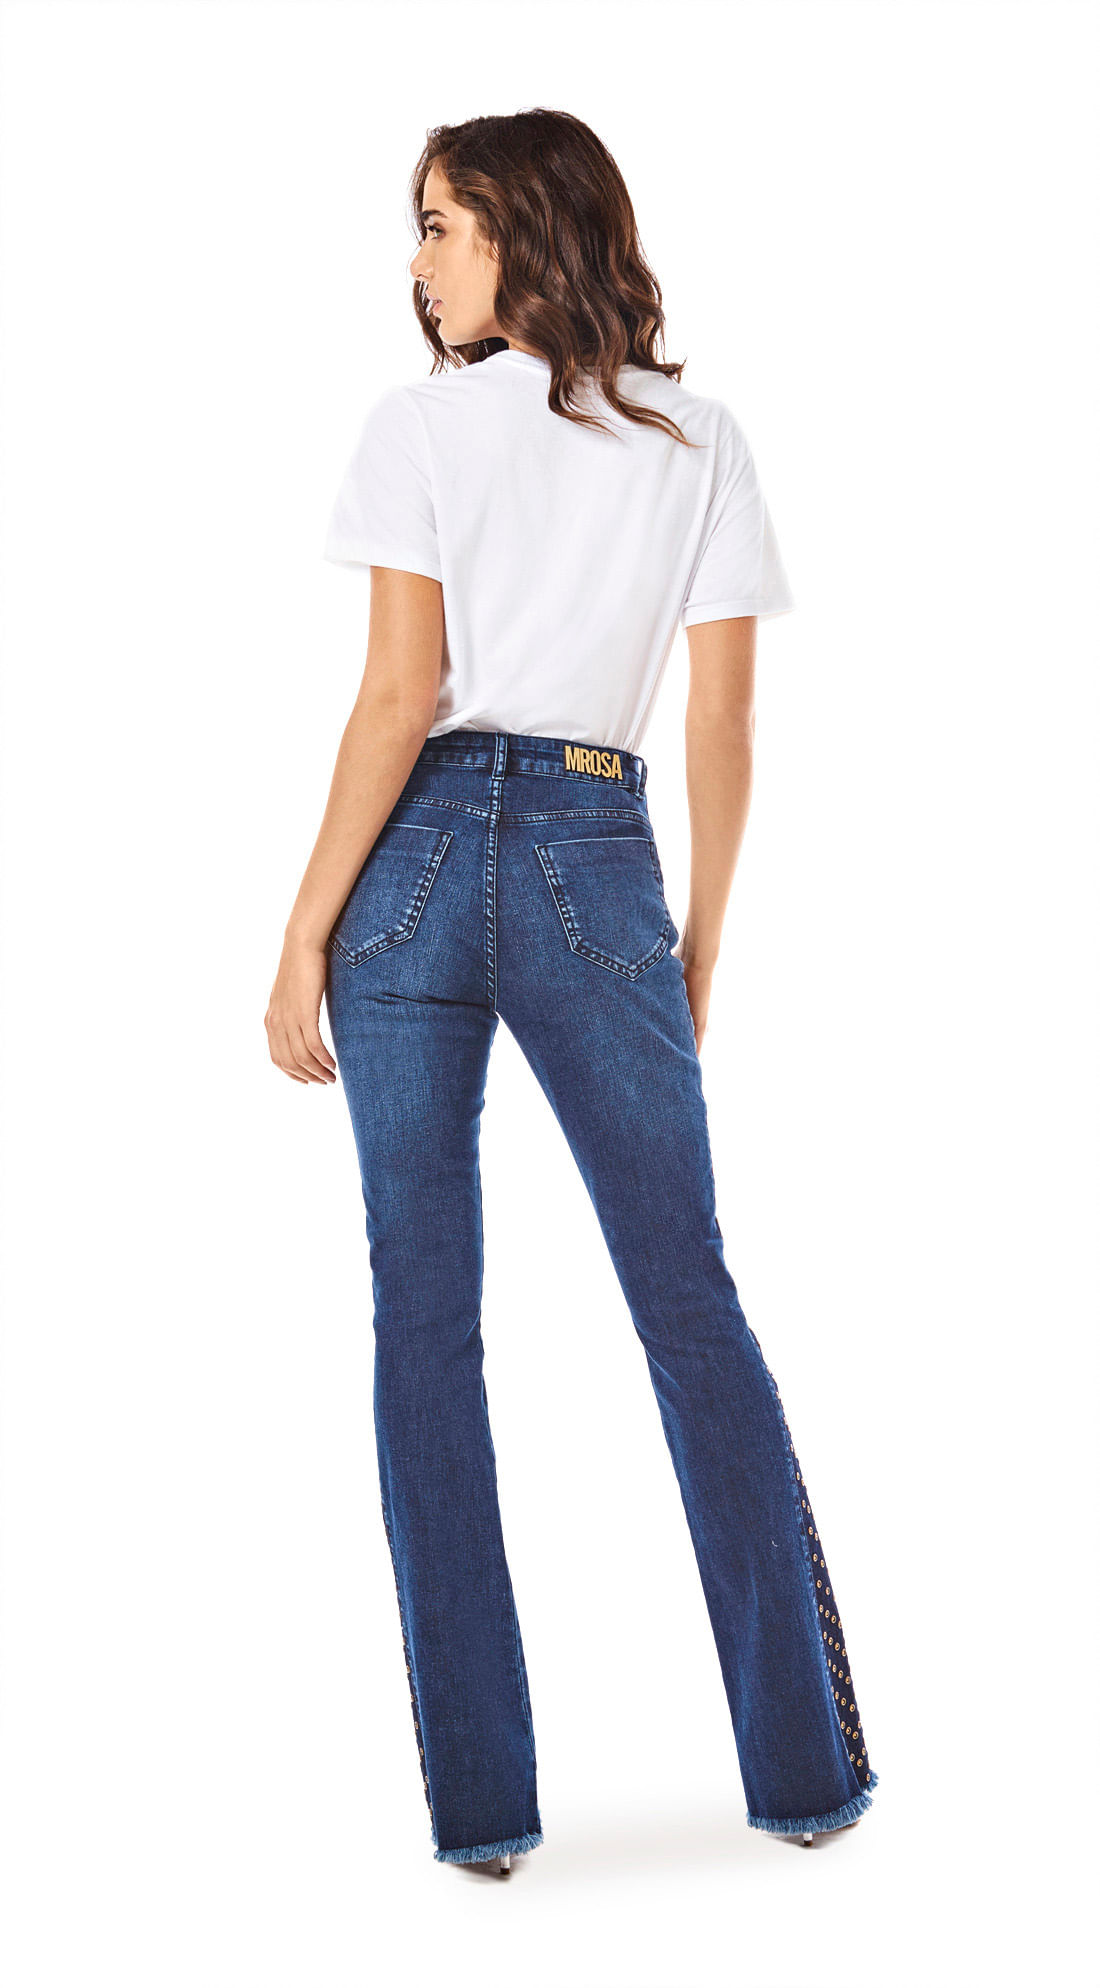 ed21d7f0f Calca Boot Cut Carol Cos Intermediario Com Termocolante Jeans ...